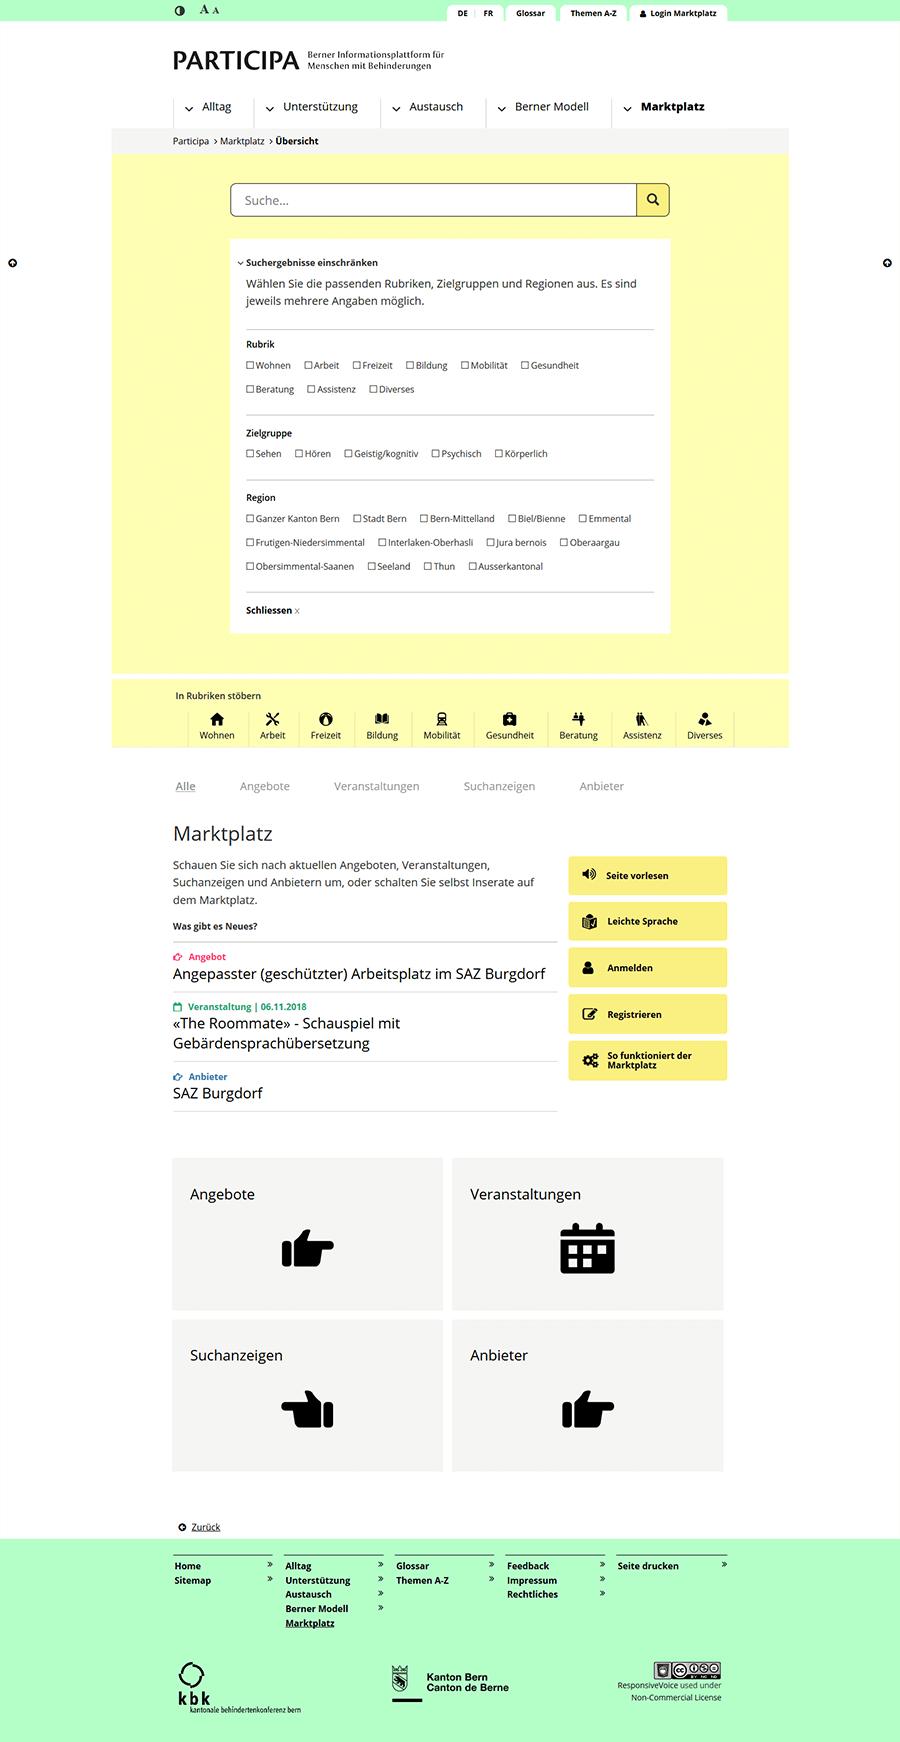 participa screenshot 2